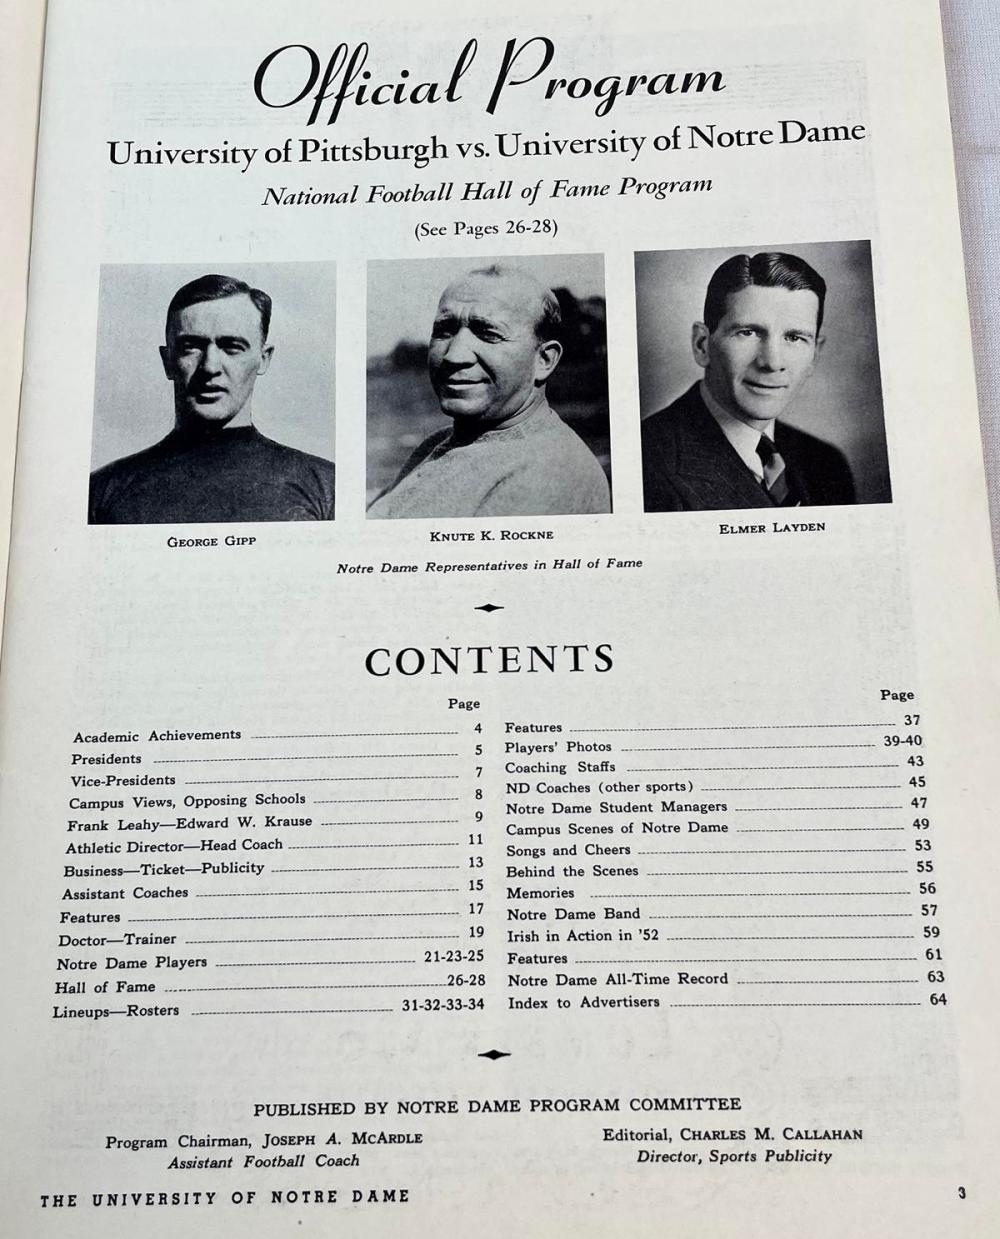 October 17, 1953 Pittsburgh vs. Notre Dame Hall of Fame Game Official Program